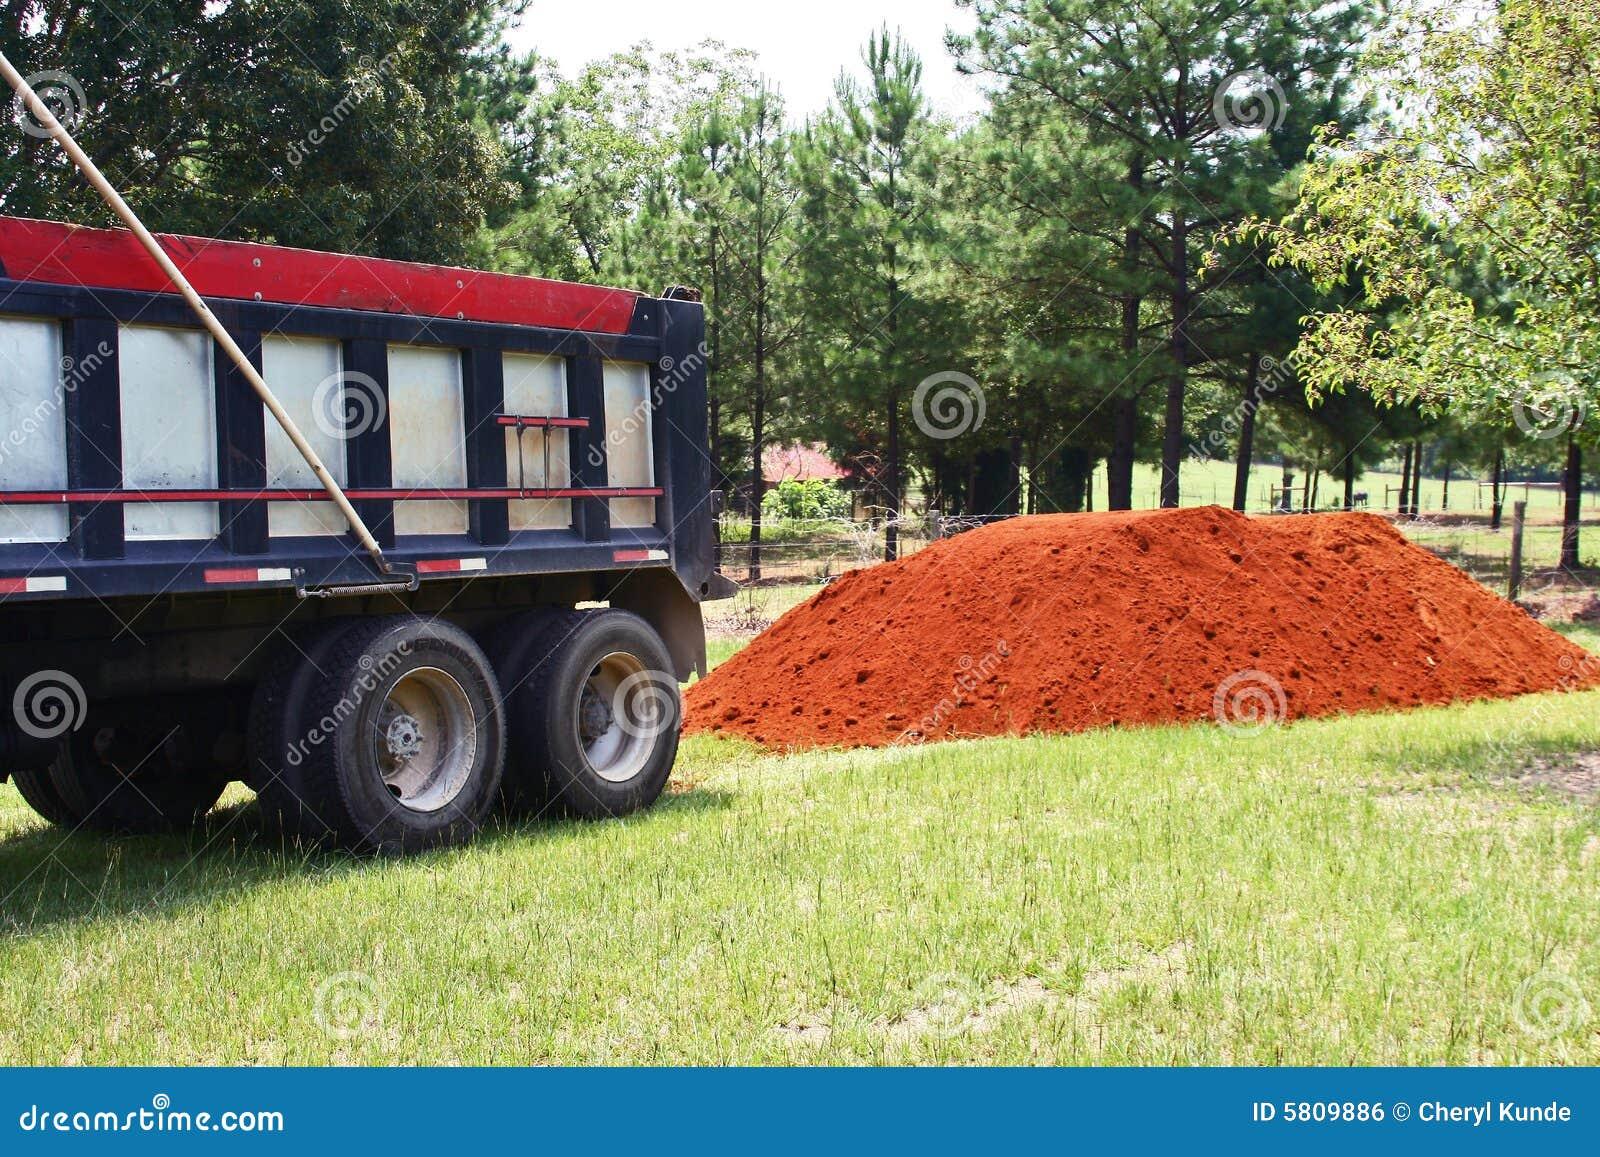 dump truck and dirt pile stock photo image of heavy dump 5809886. Black Bedroom Furniture Sets. Home Design Ideas